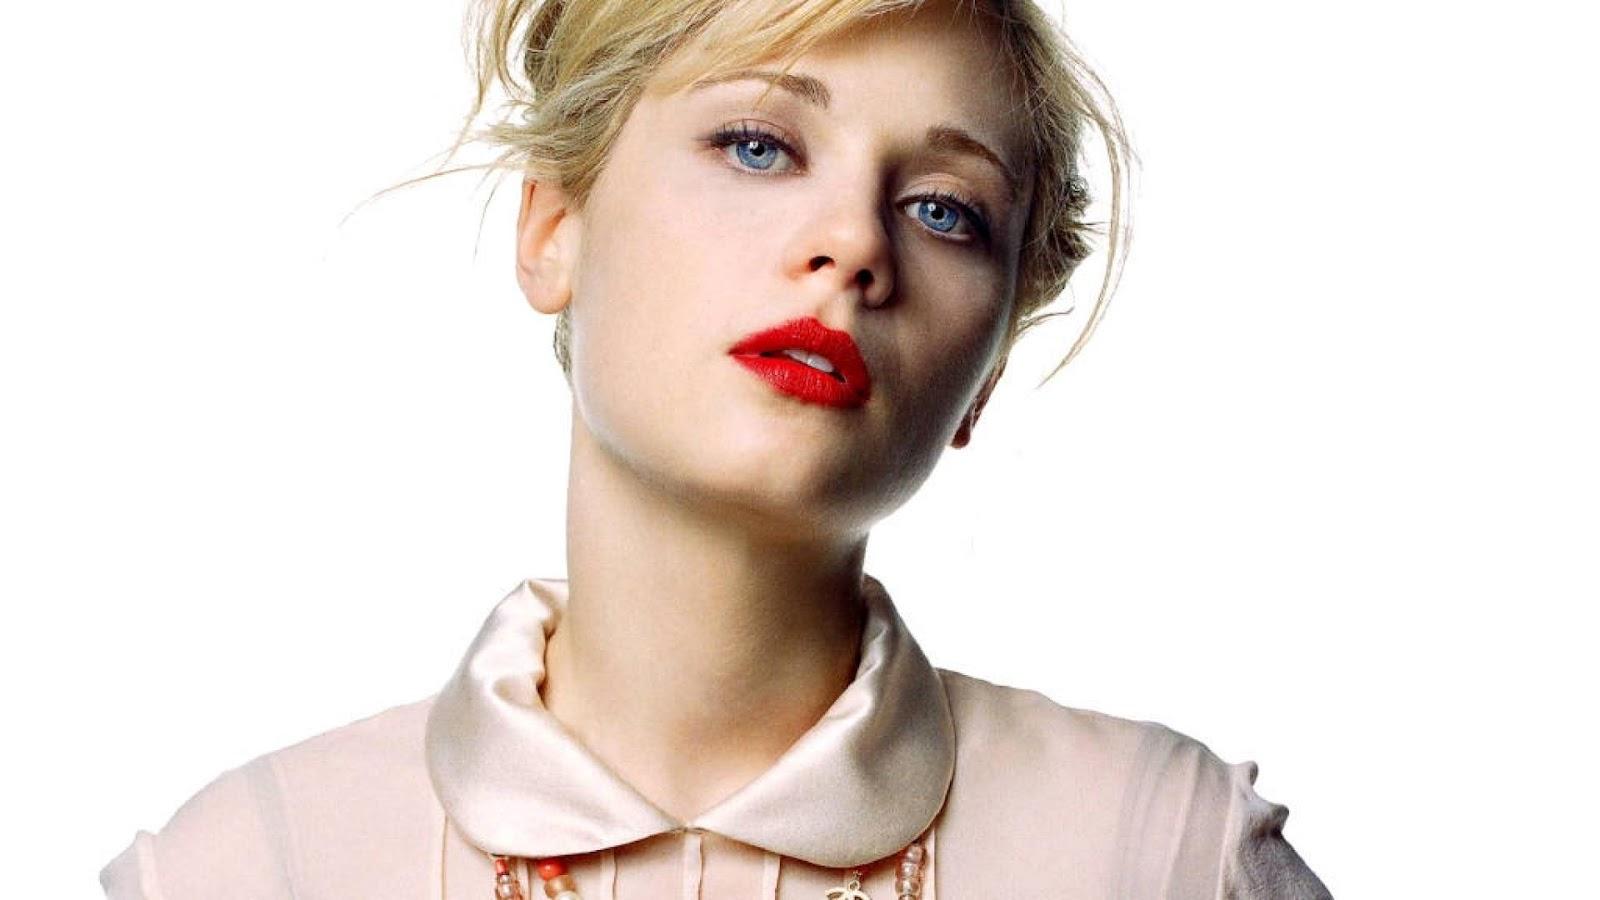 http://3.bp.blogspot.com/-4RPfsnDZcWo/UByyUt45uOI/AAAAAAAAJ5s/Ylmjx-omaCo/s1600/zooey-deschanel-lipstick-faces-1080x1920.jpg